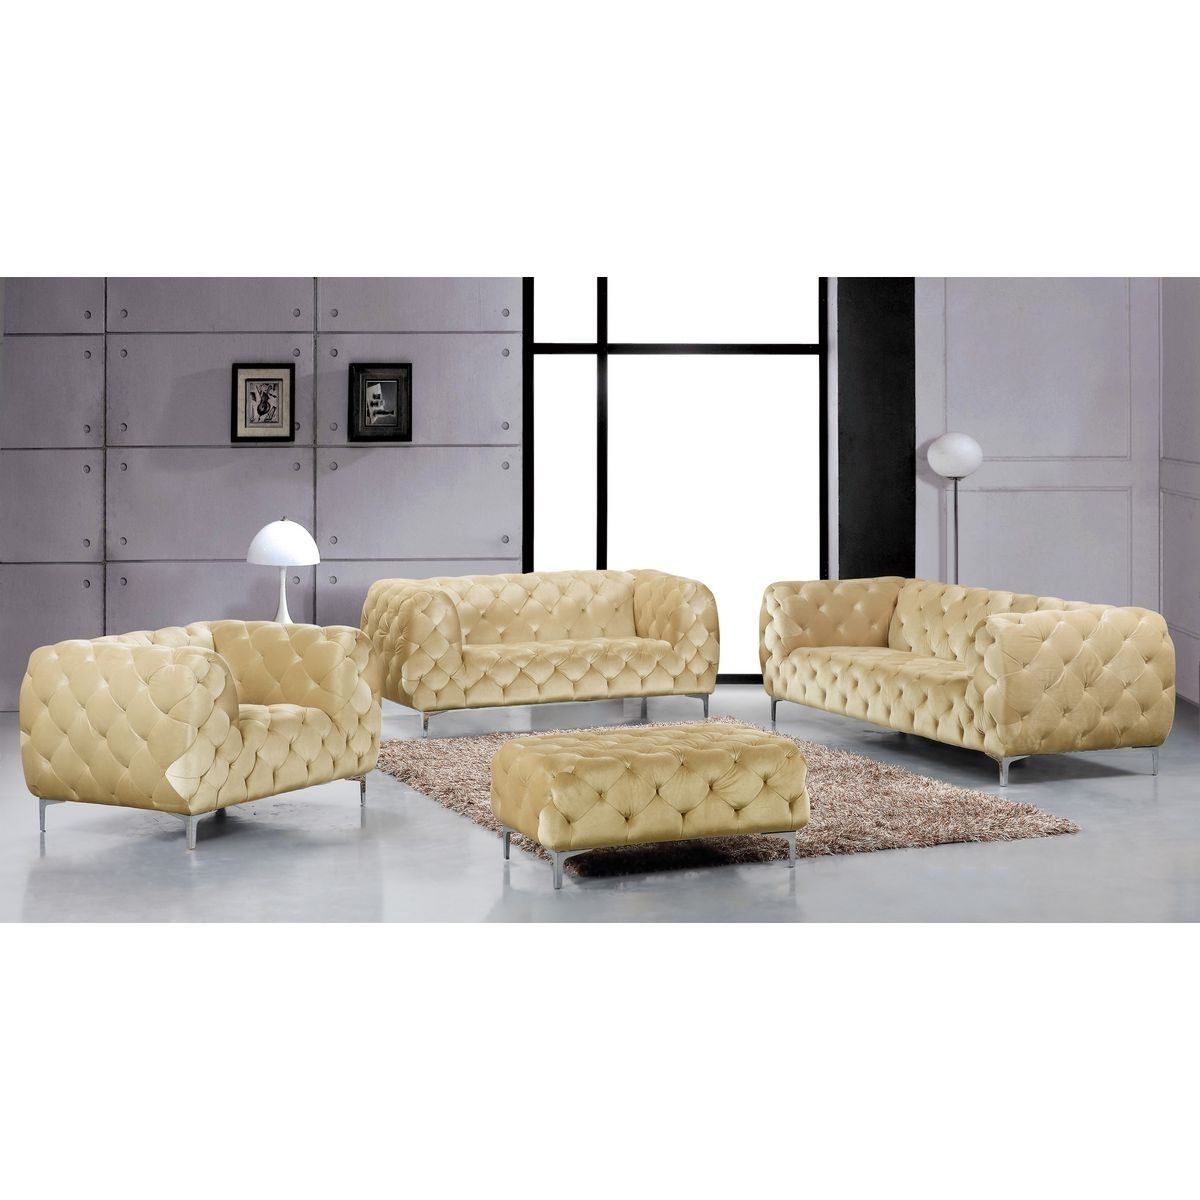 Latest Kijiji Kitchener Sectional Sofas Inside Furniture : Green Tufted Chaise Lounge Furniture Making Ottawa (View 9 of 15)